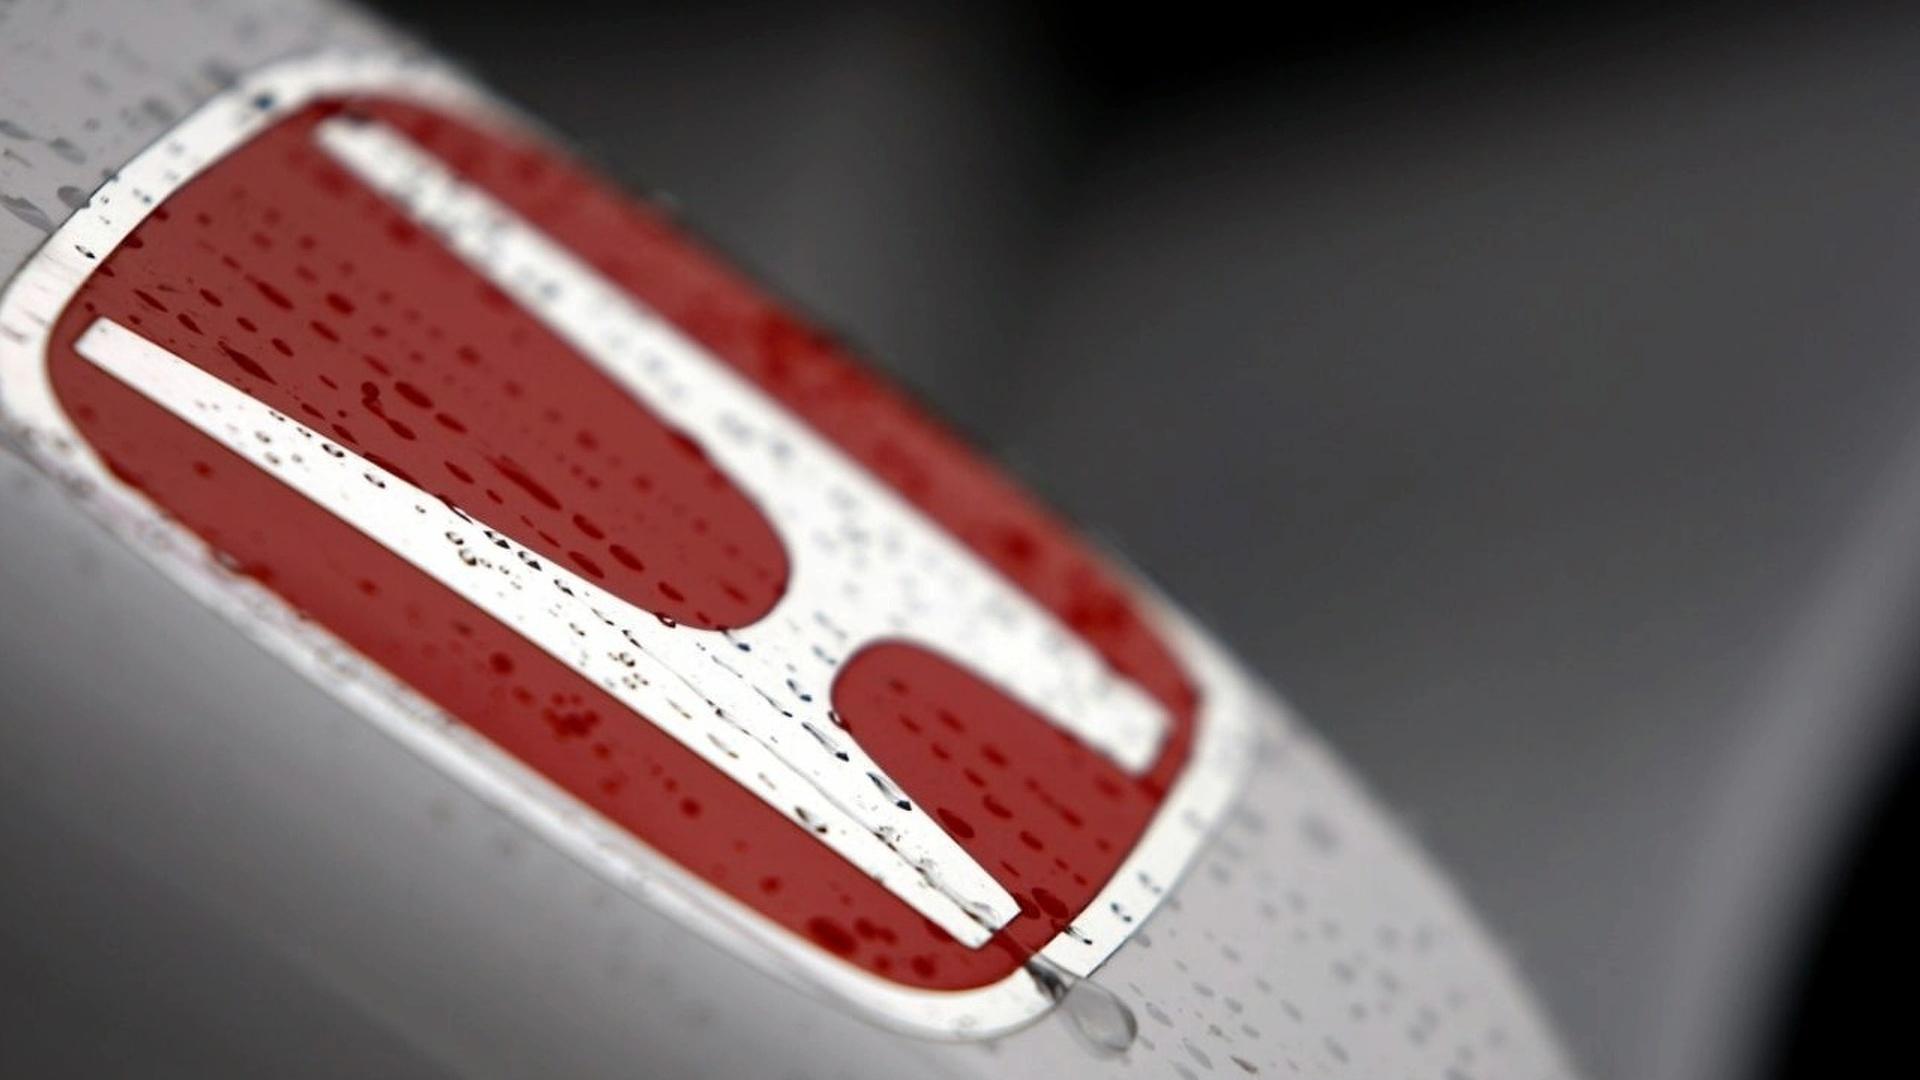 Honda F1 Rescued - To be called *Brackley F1*